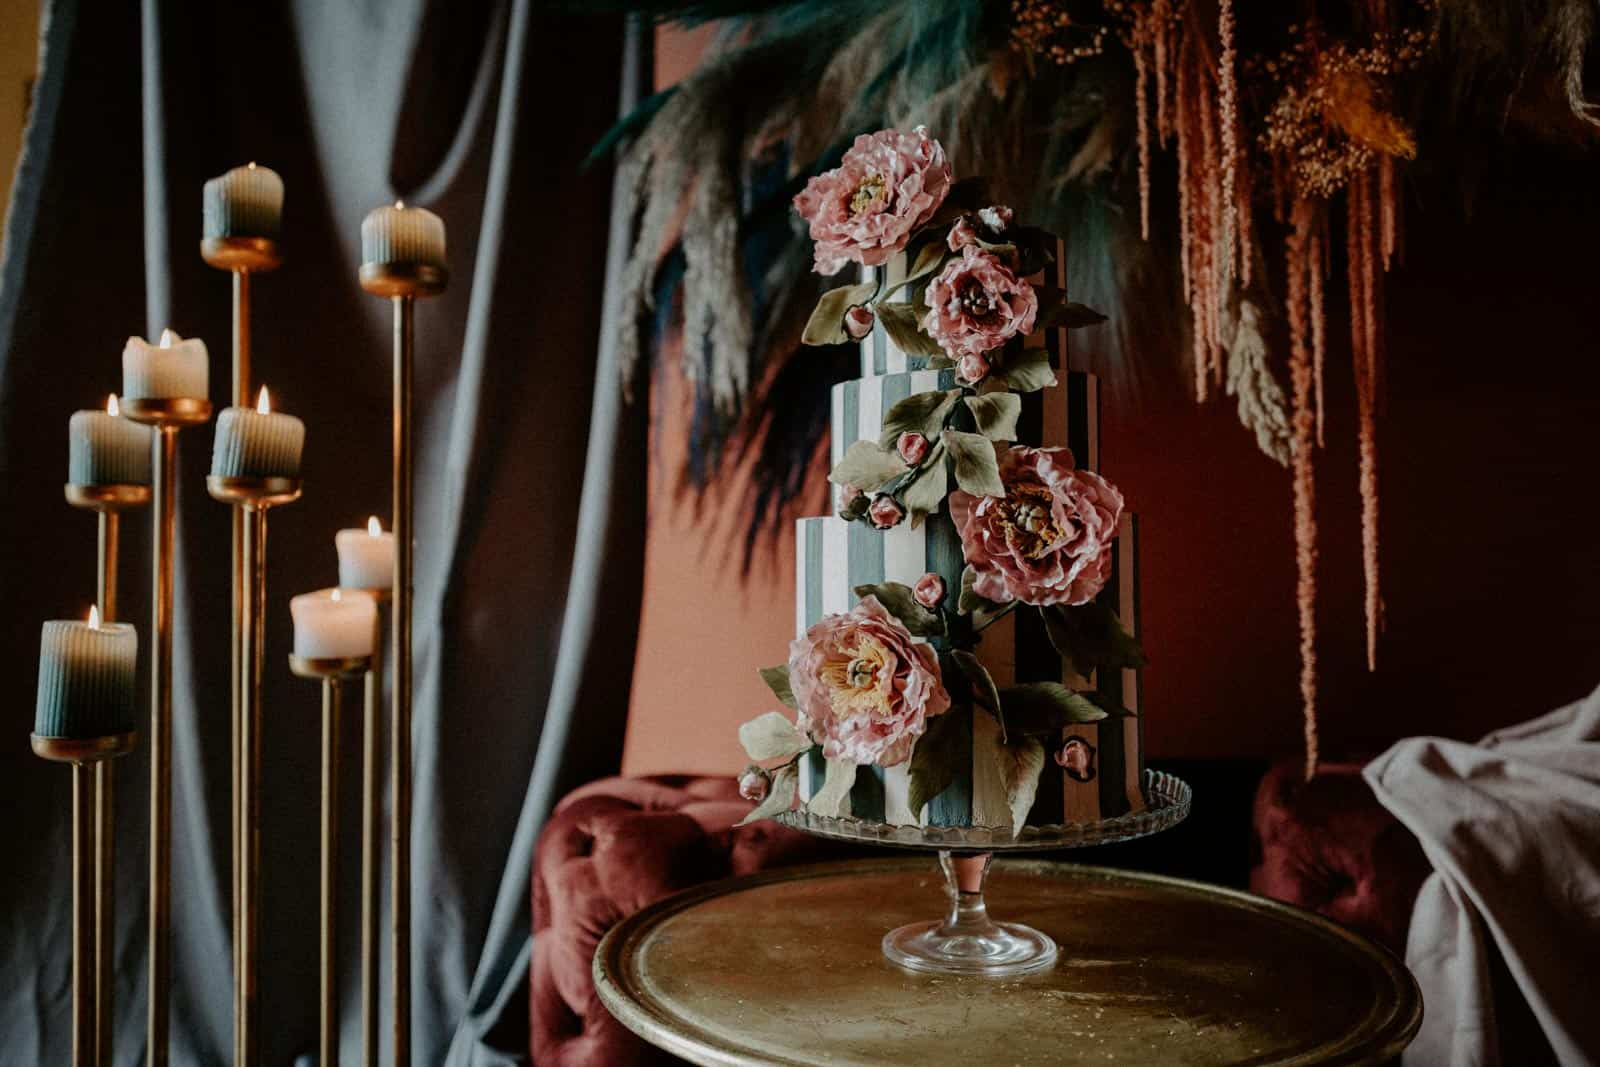 Dramatic striped wedding cake by Florence Italy cake designer Tuscan Wedding Cakes